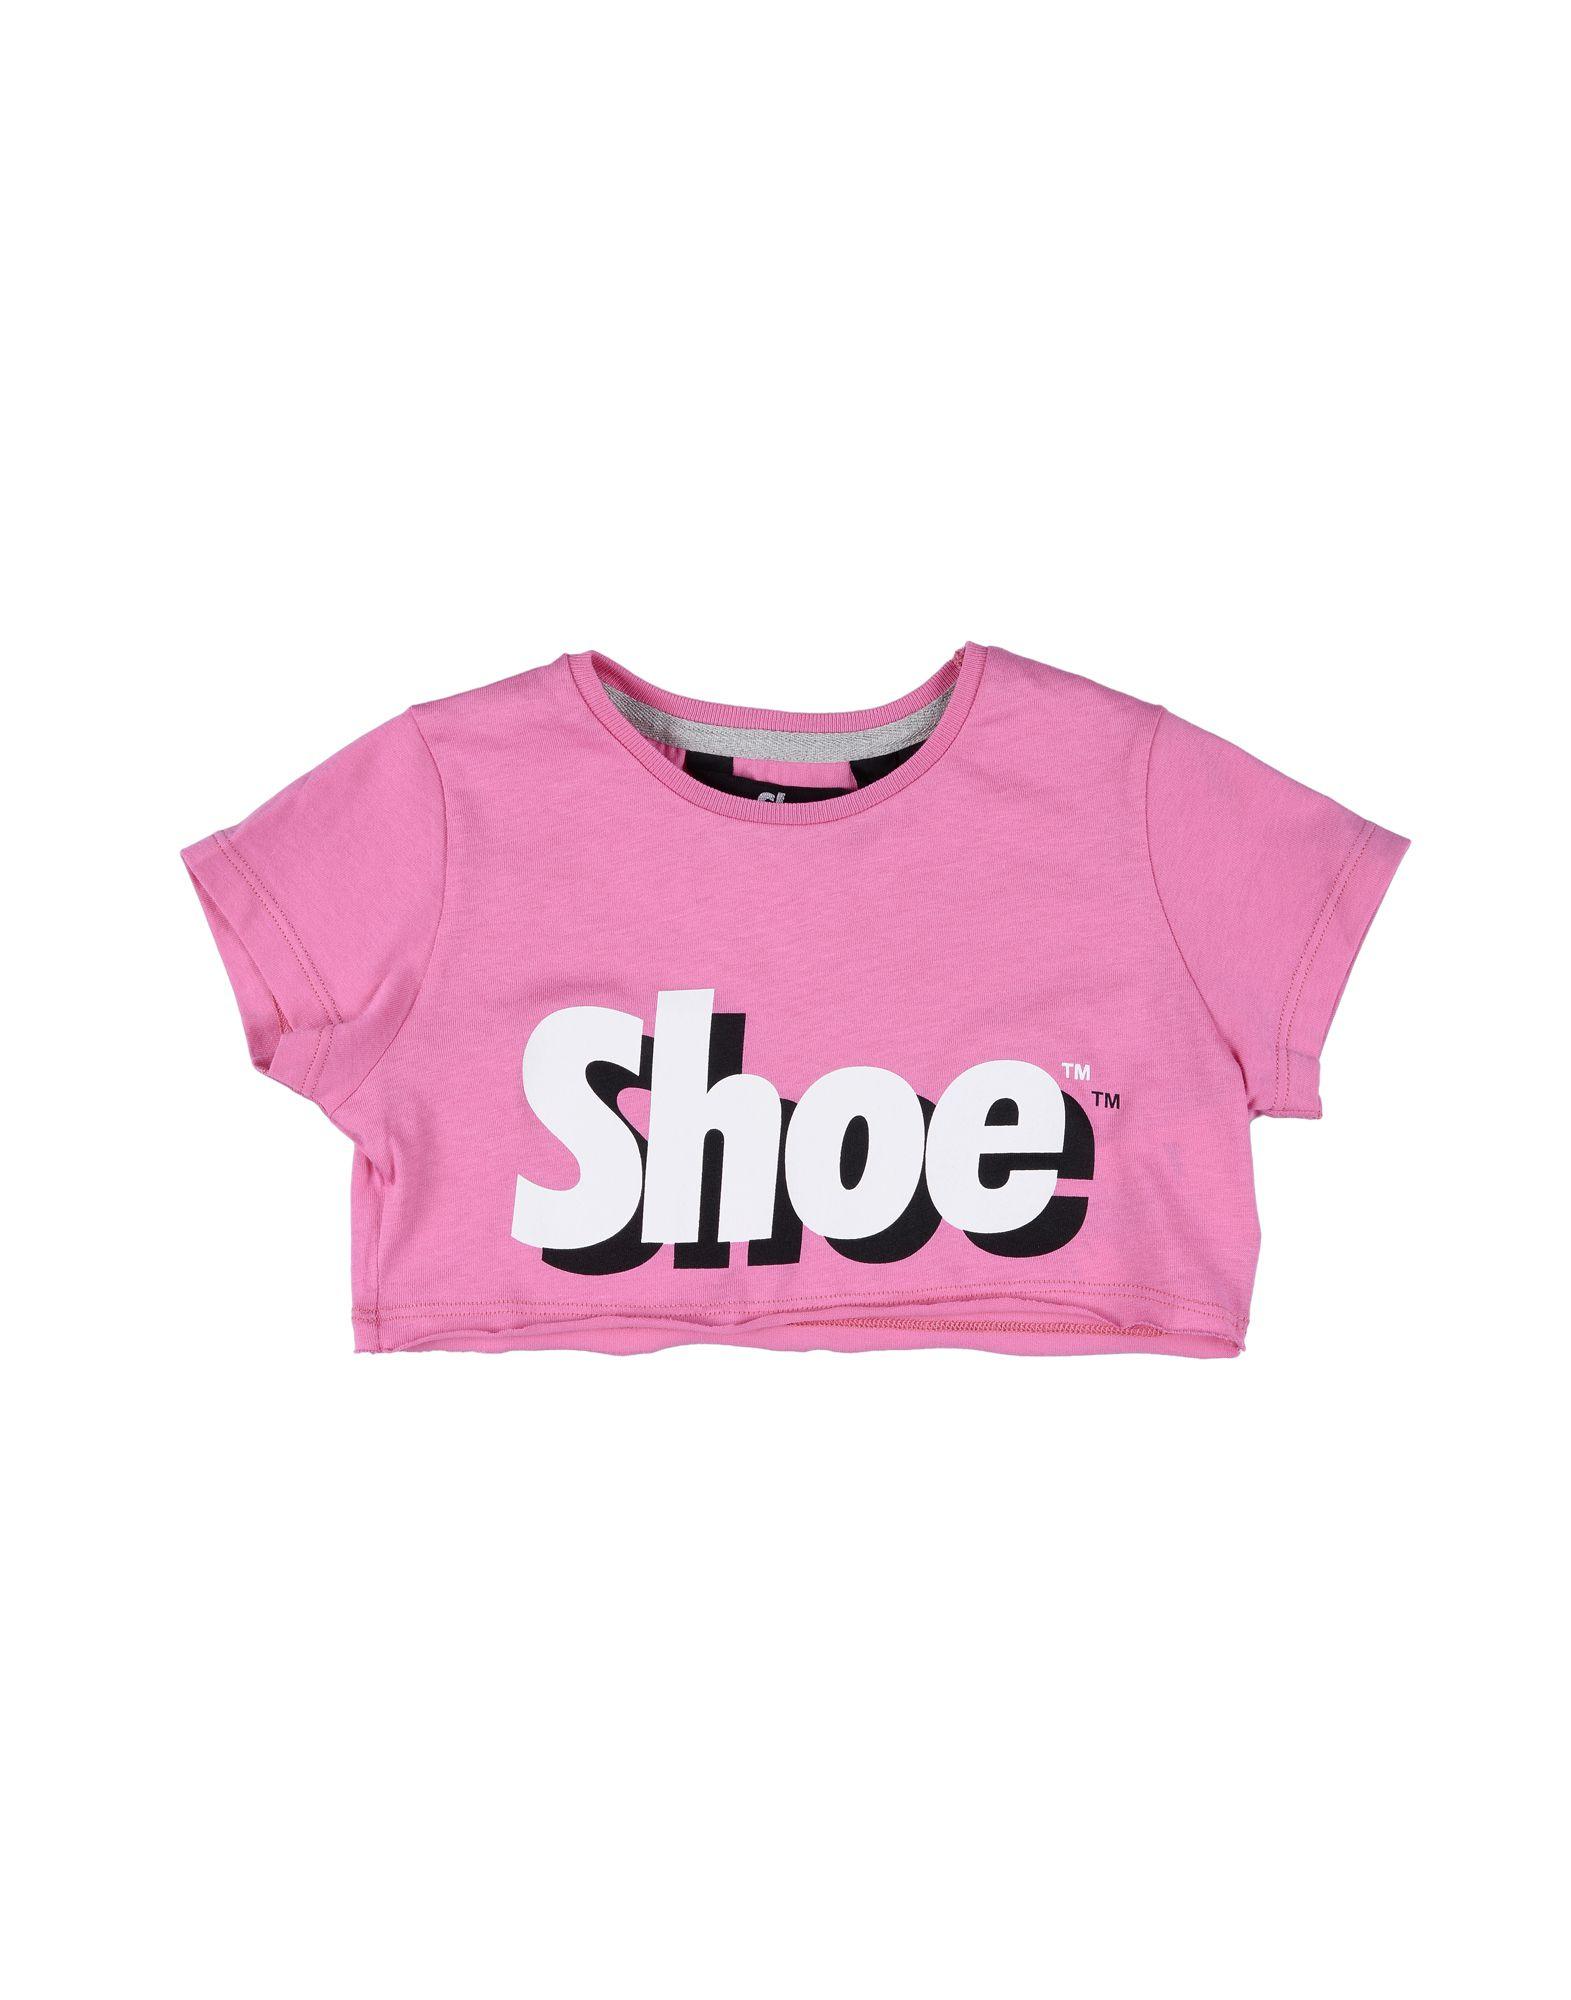 Shoeshine Kids' T-shirts In Fuchsia